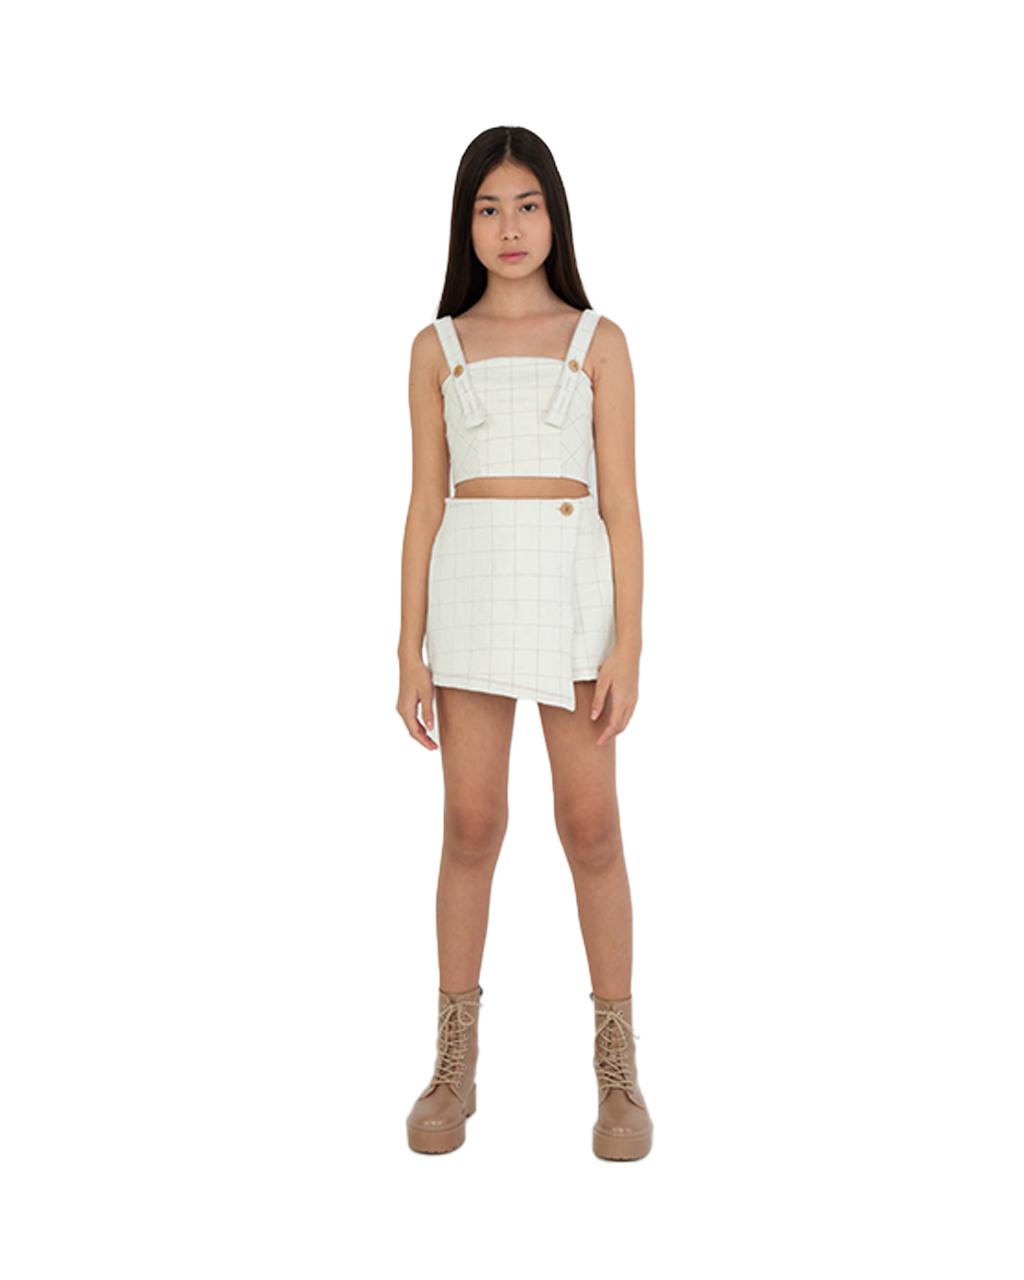 Conjunto Teen Top Recortes com Shorts Saia Off White Dimy Candy